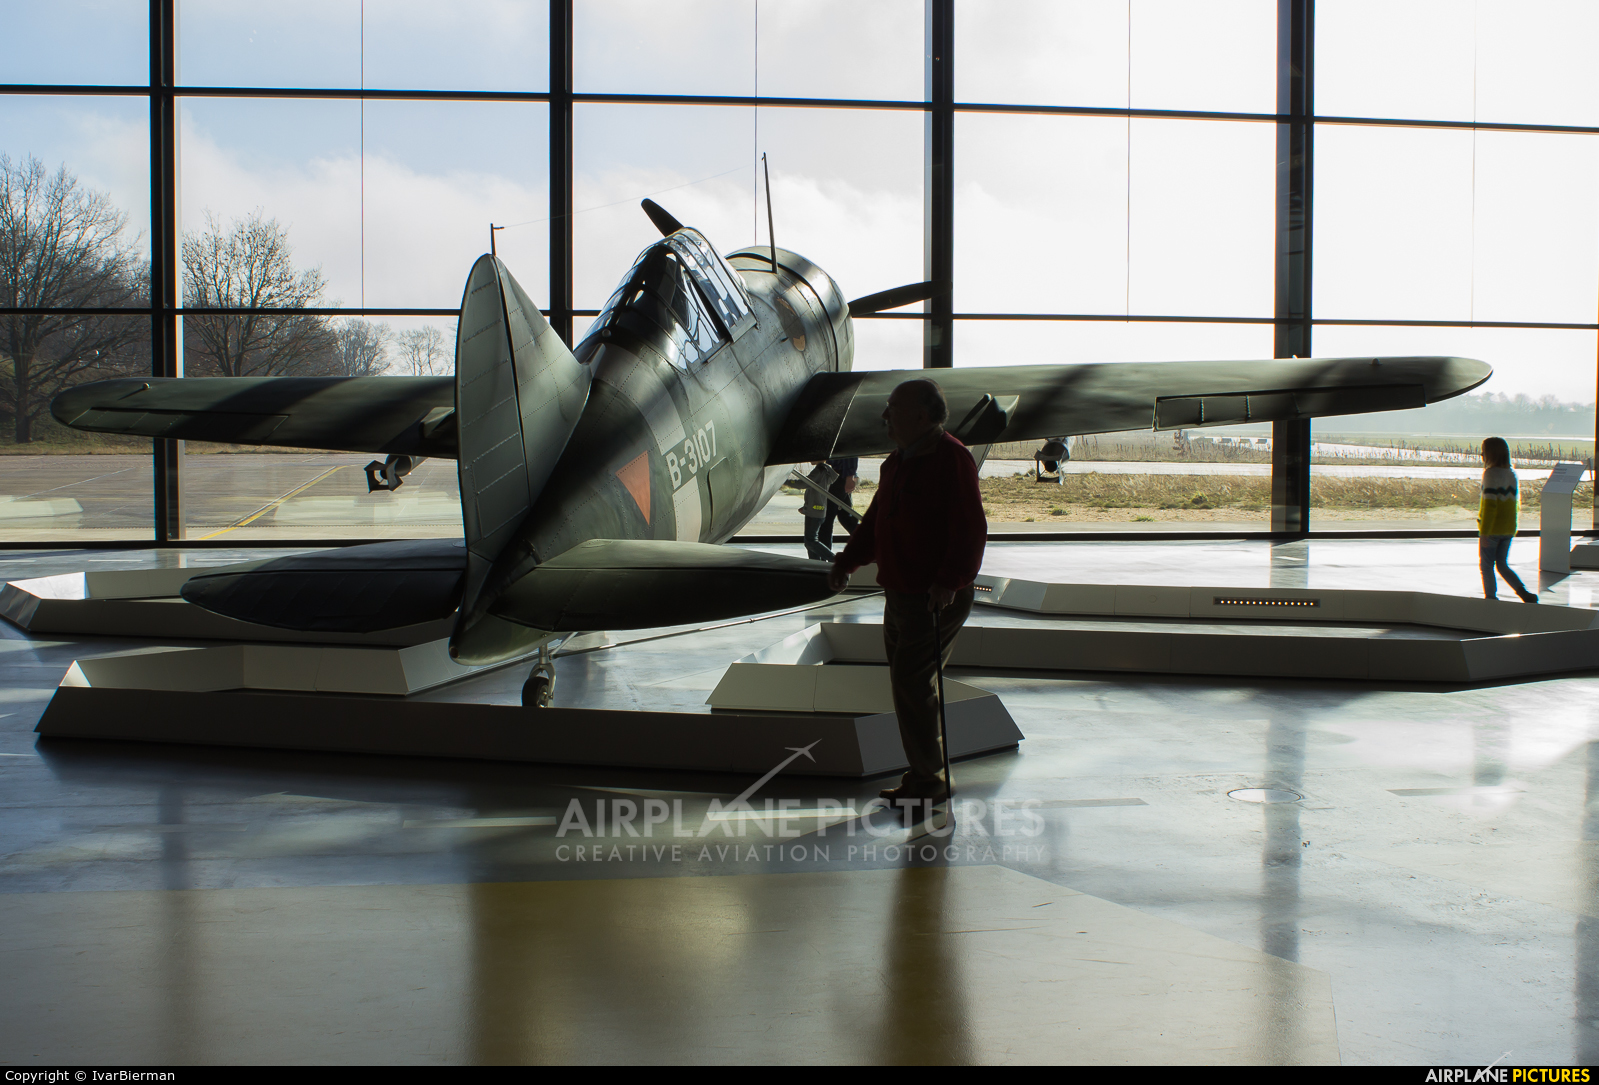 Netherlands - Air Force B-3107 aircraft at Soesterberg - Nationaal Militair Museum